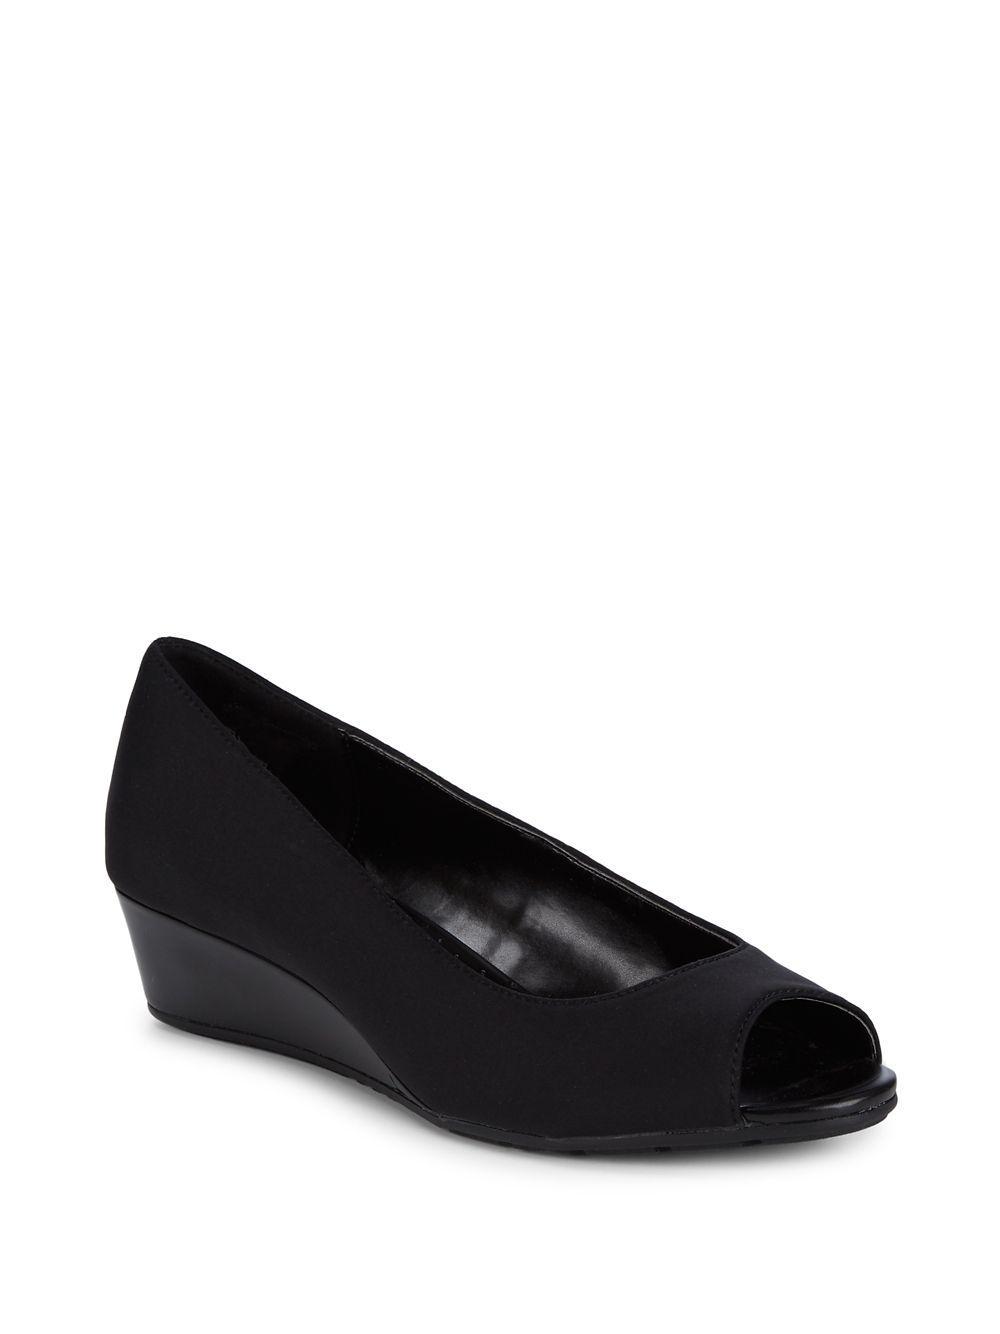 fa470e41a069 Lyst - Bandolino Candra Peep-toe Demi-wedge Pumps in Black